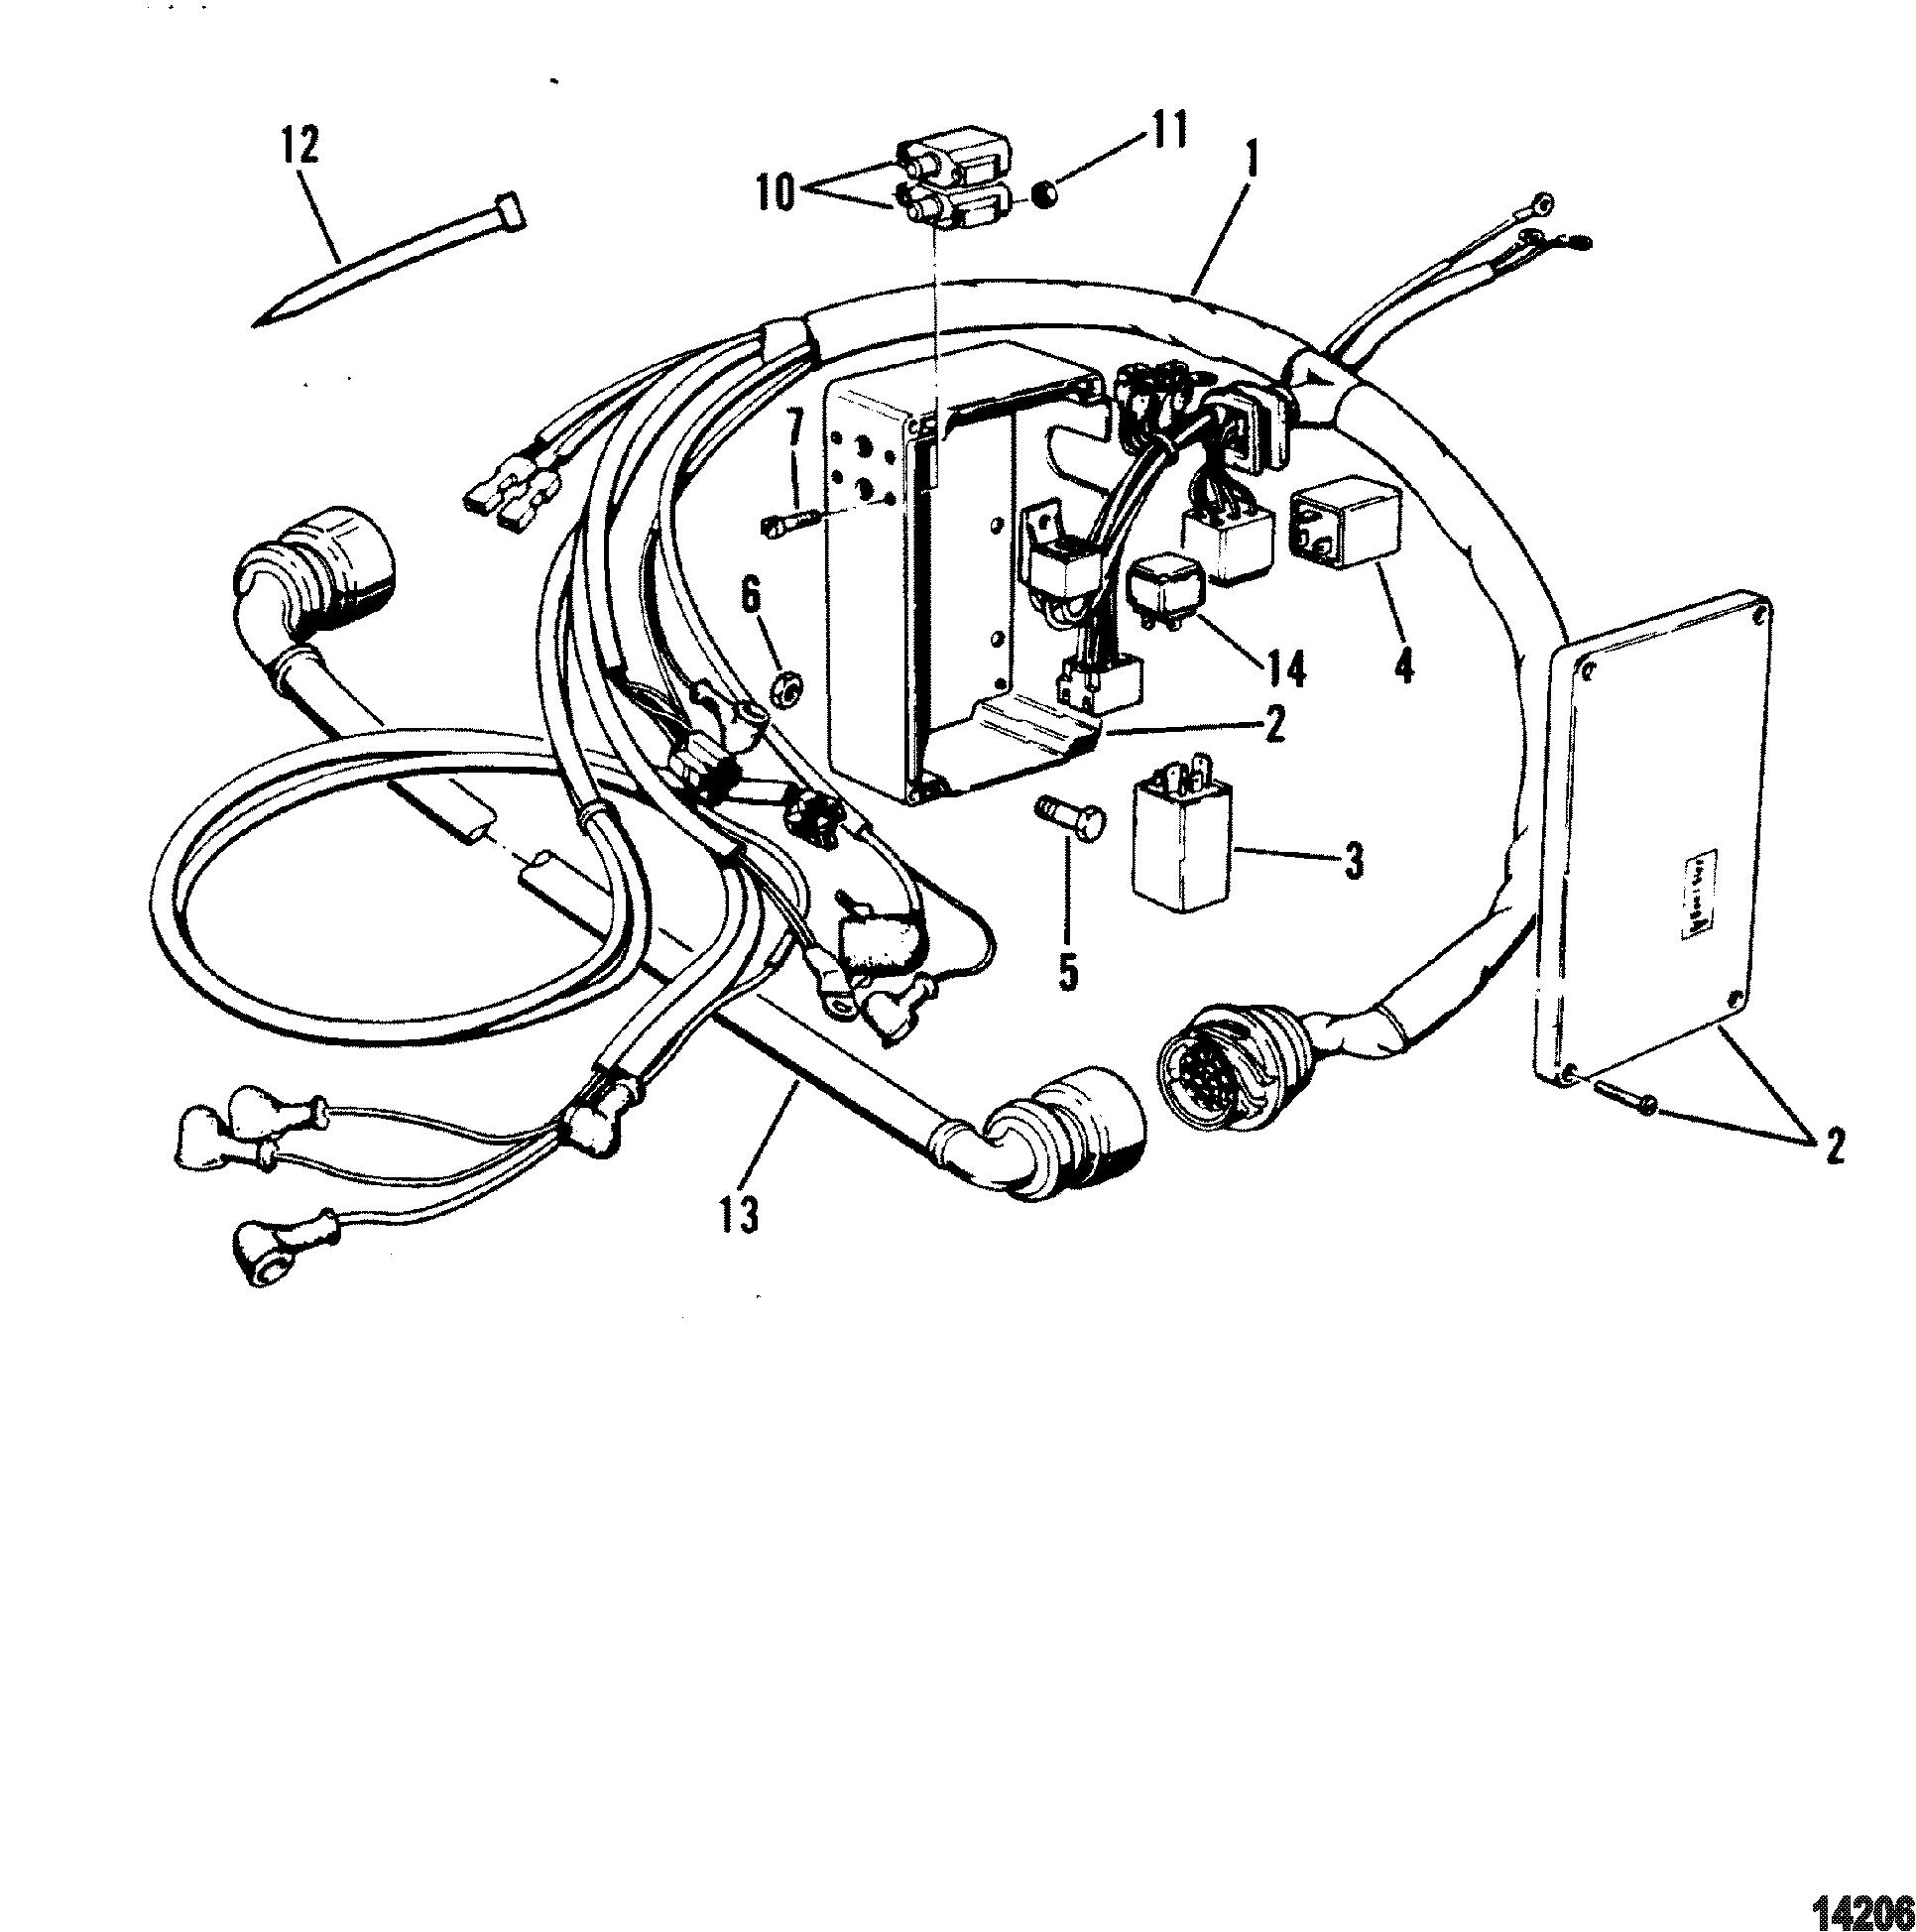 Motor Harness For Mercruiser Mie Cummins Mercruiser